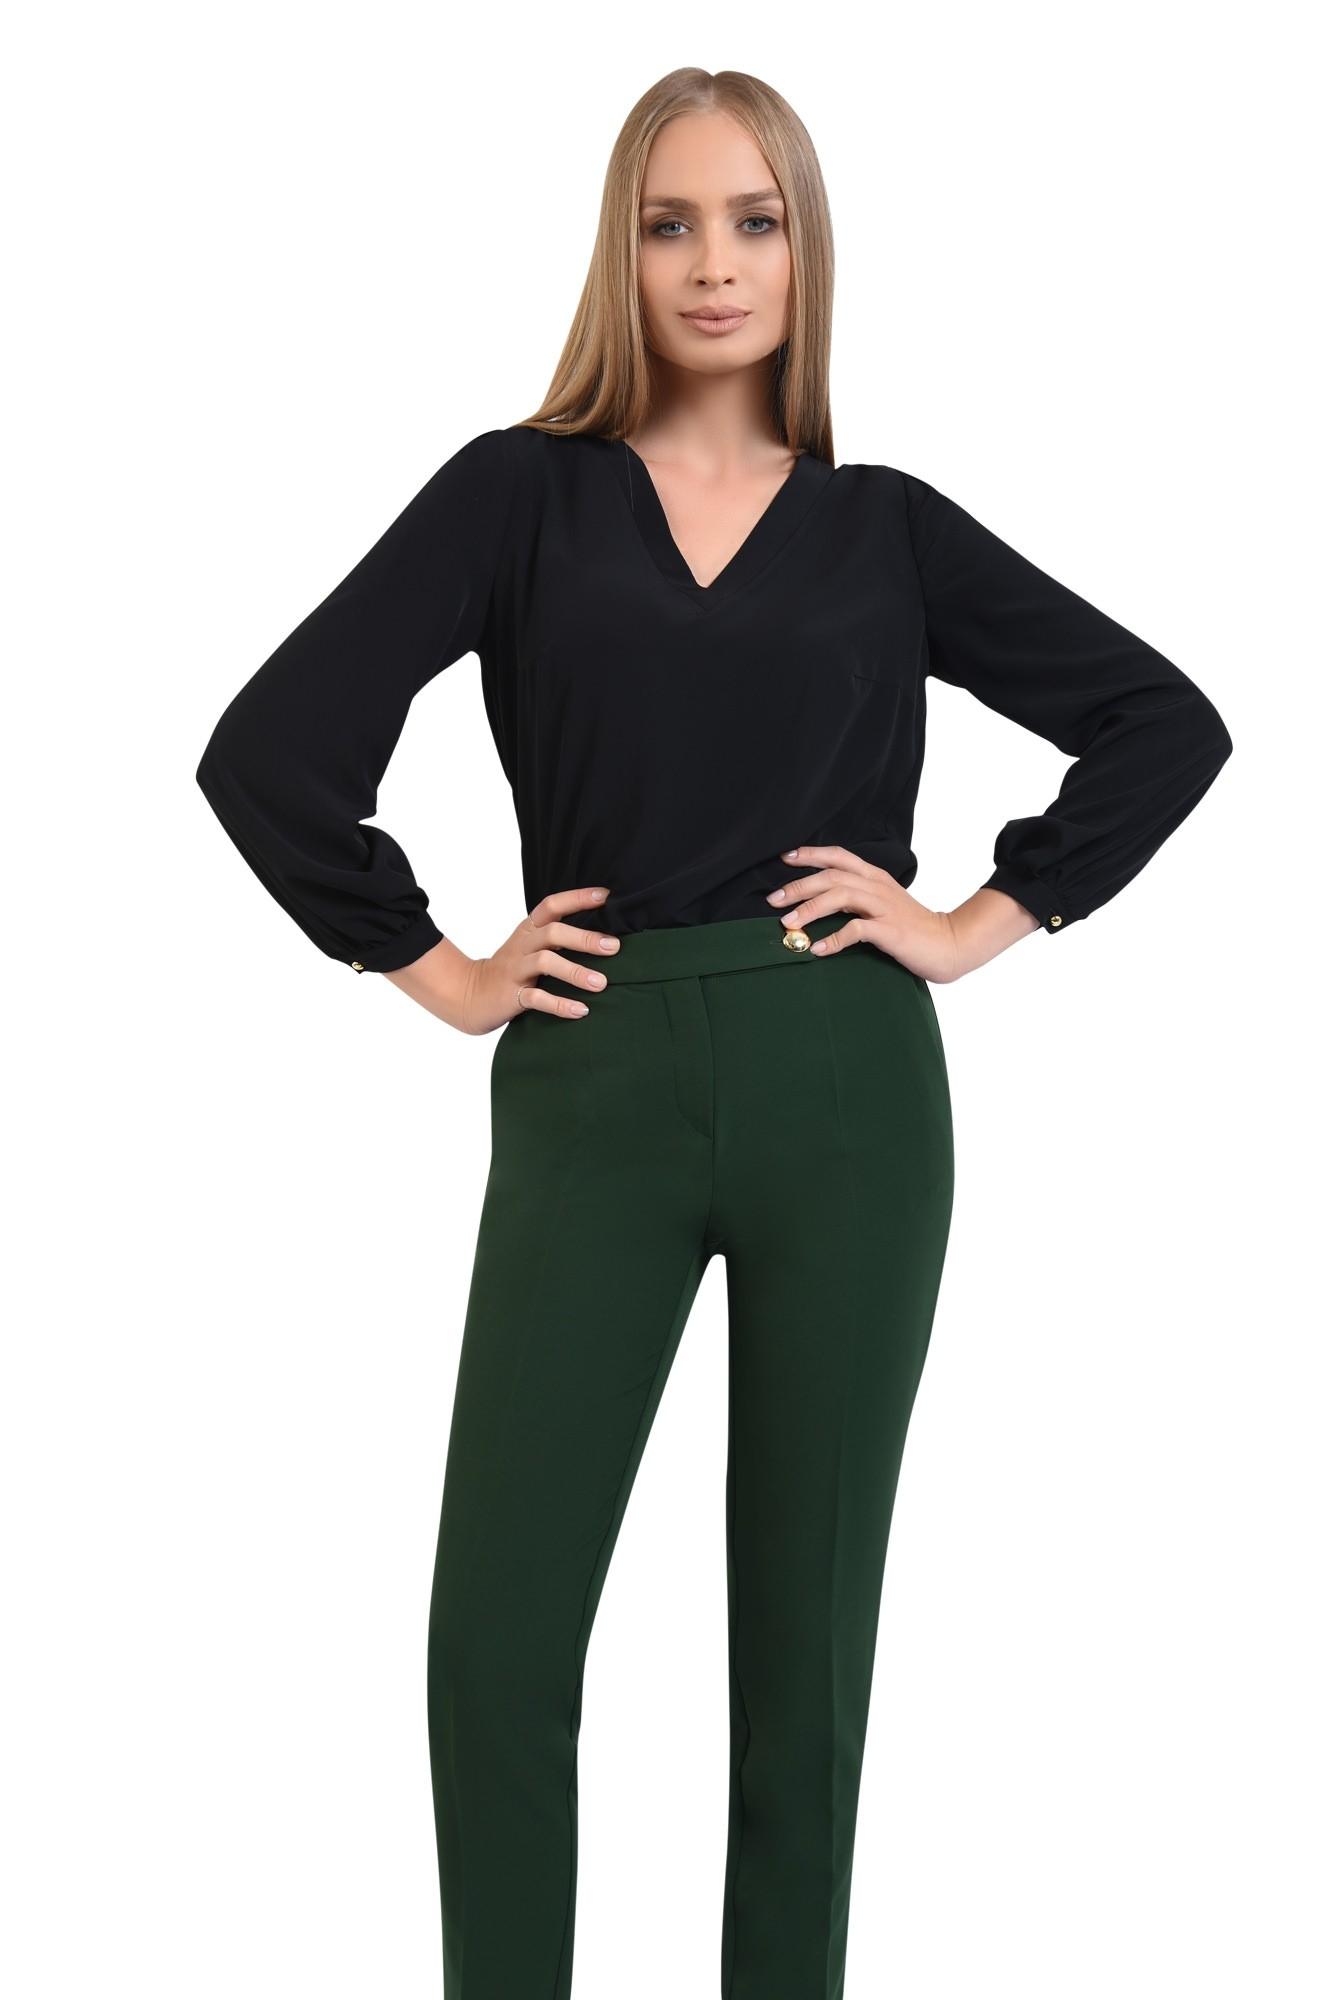 0 - pantaloni casual, verde, croi conic, talie medie